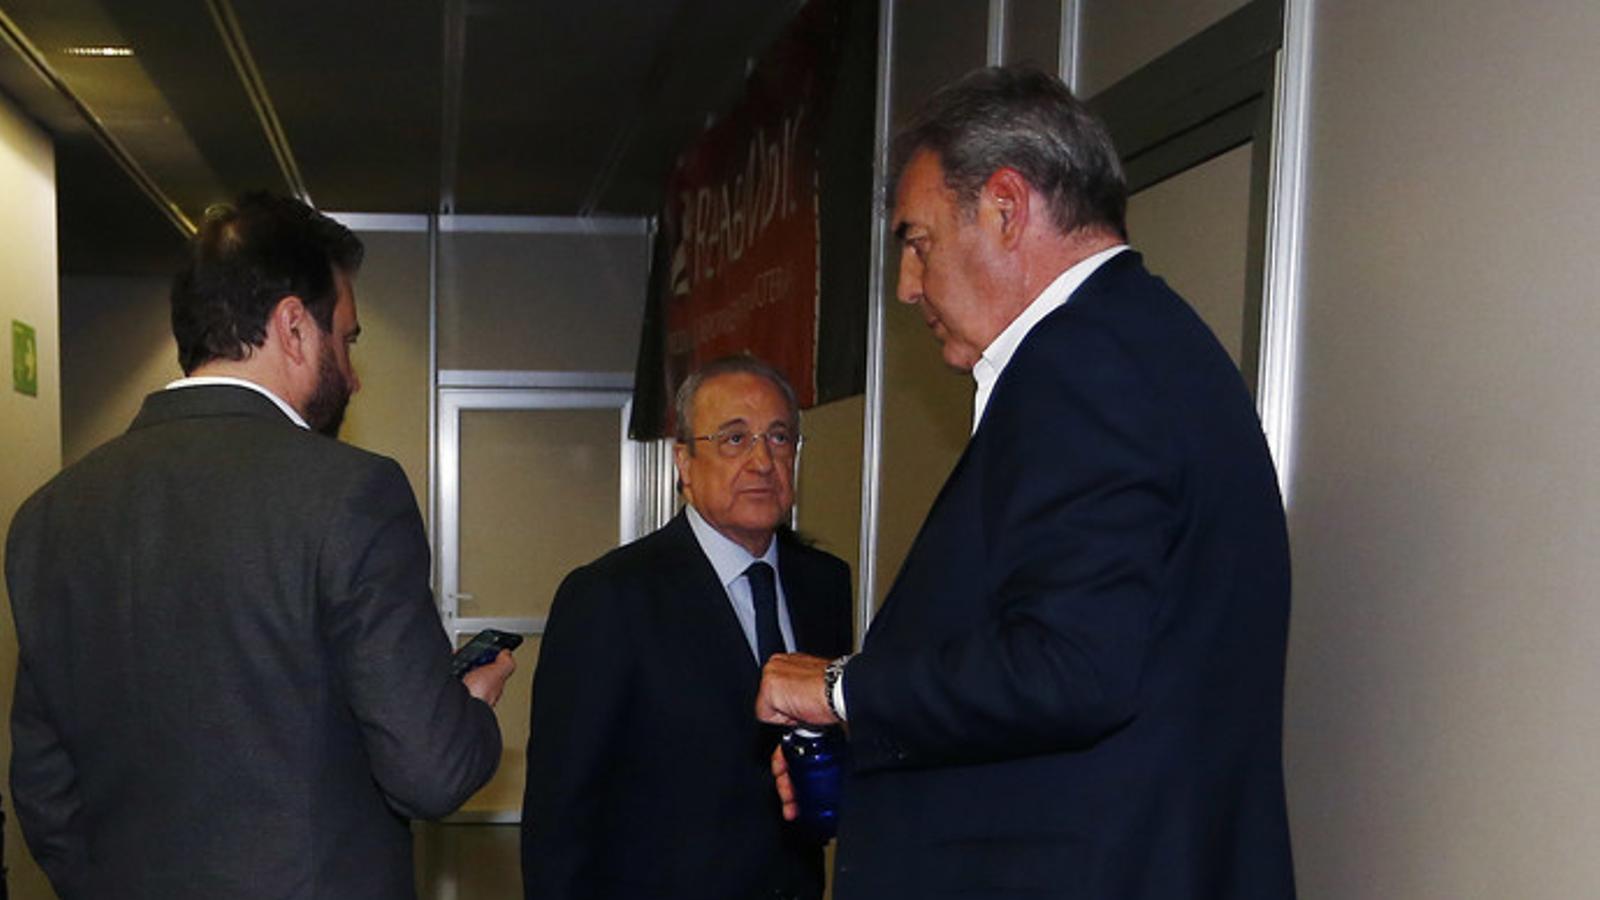 Florentino Pérez i  Juan Carlos Sánchez als passadissos del WiZink Center